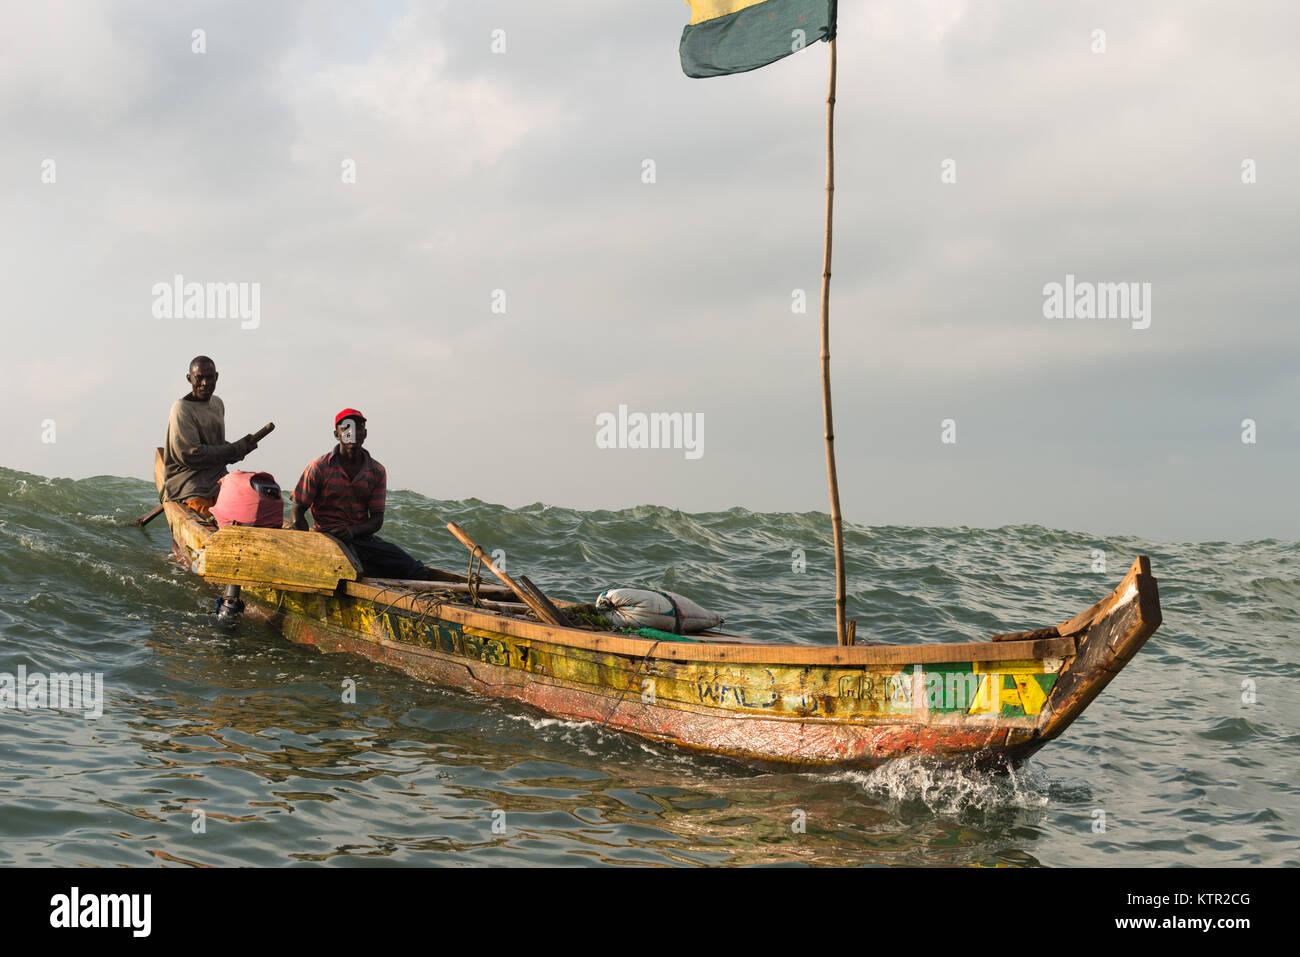 Net-fishing in an open boat along the Golden Coast, Central Region, Ghana, Africa - Stock Image